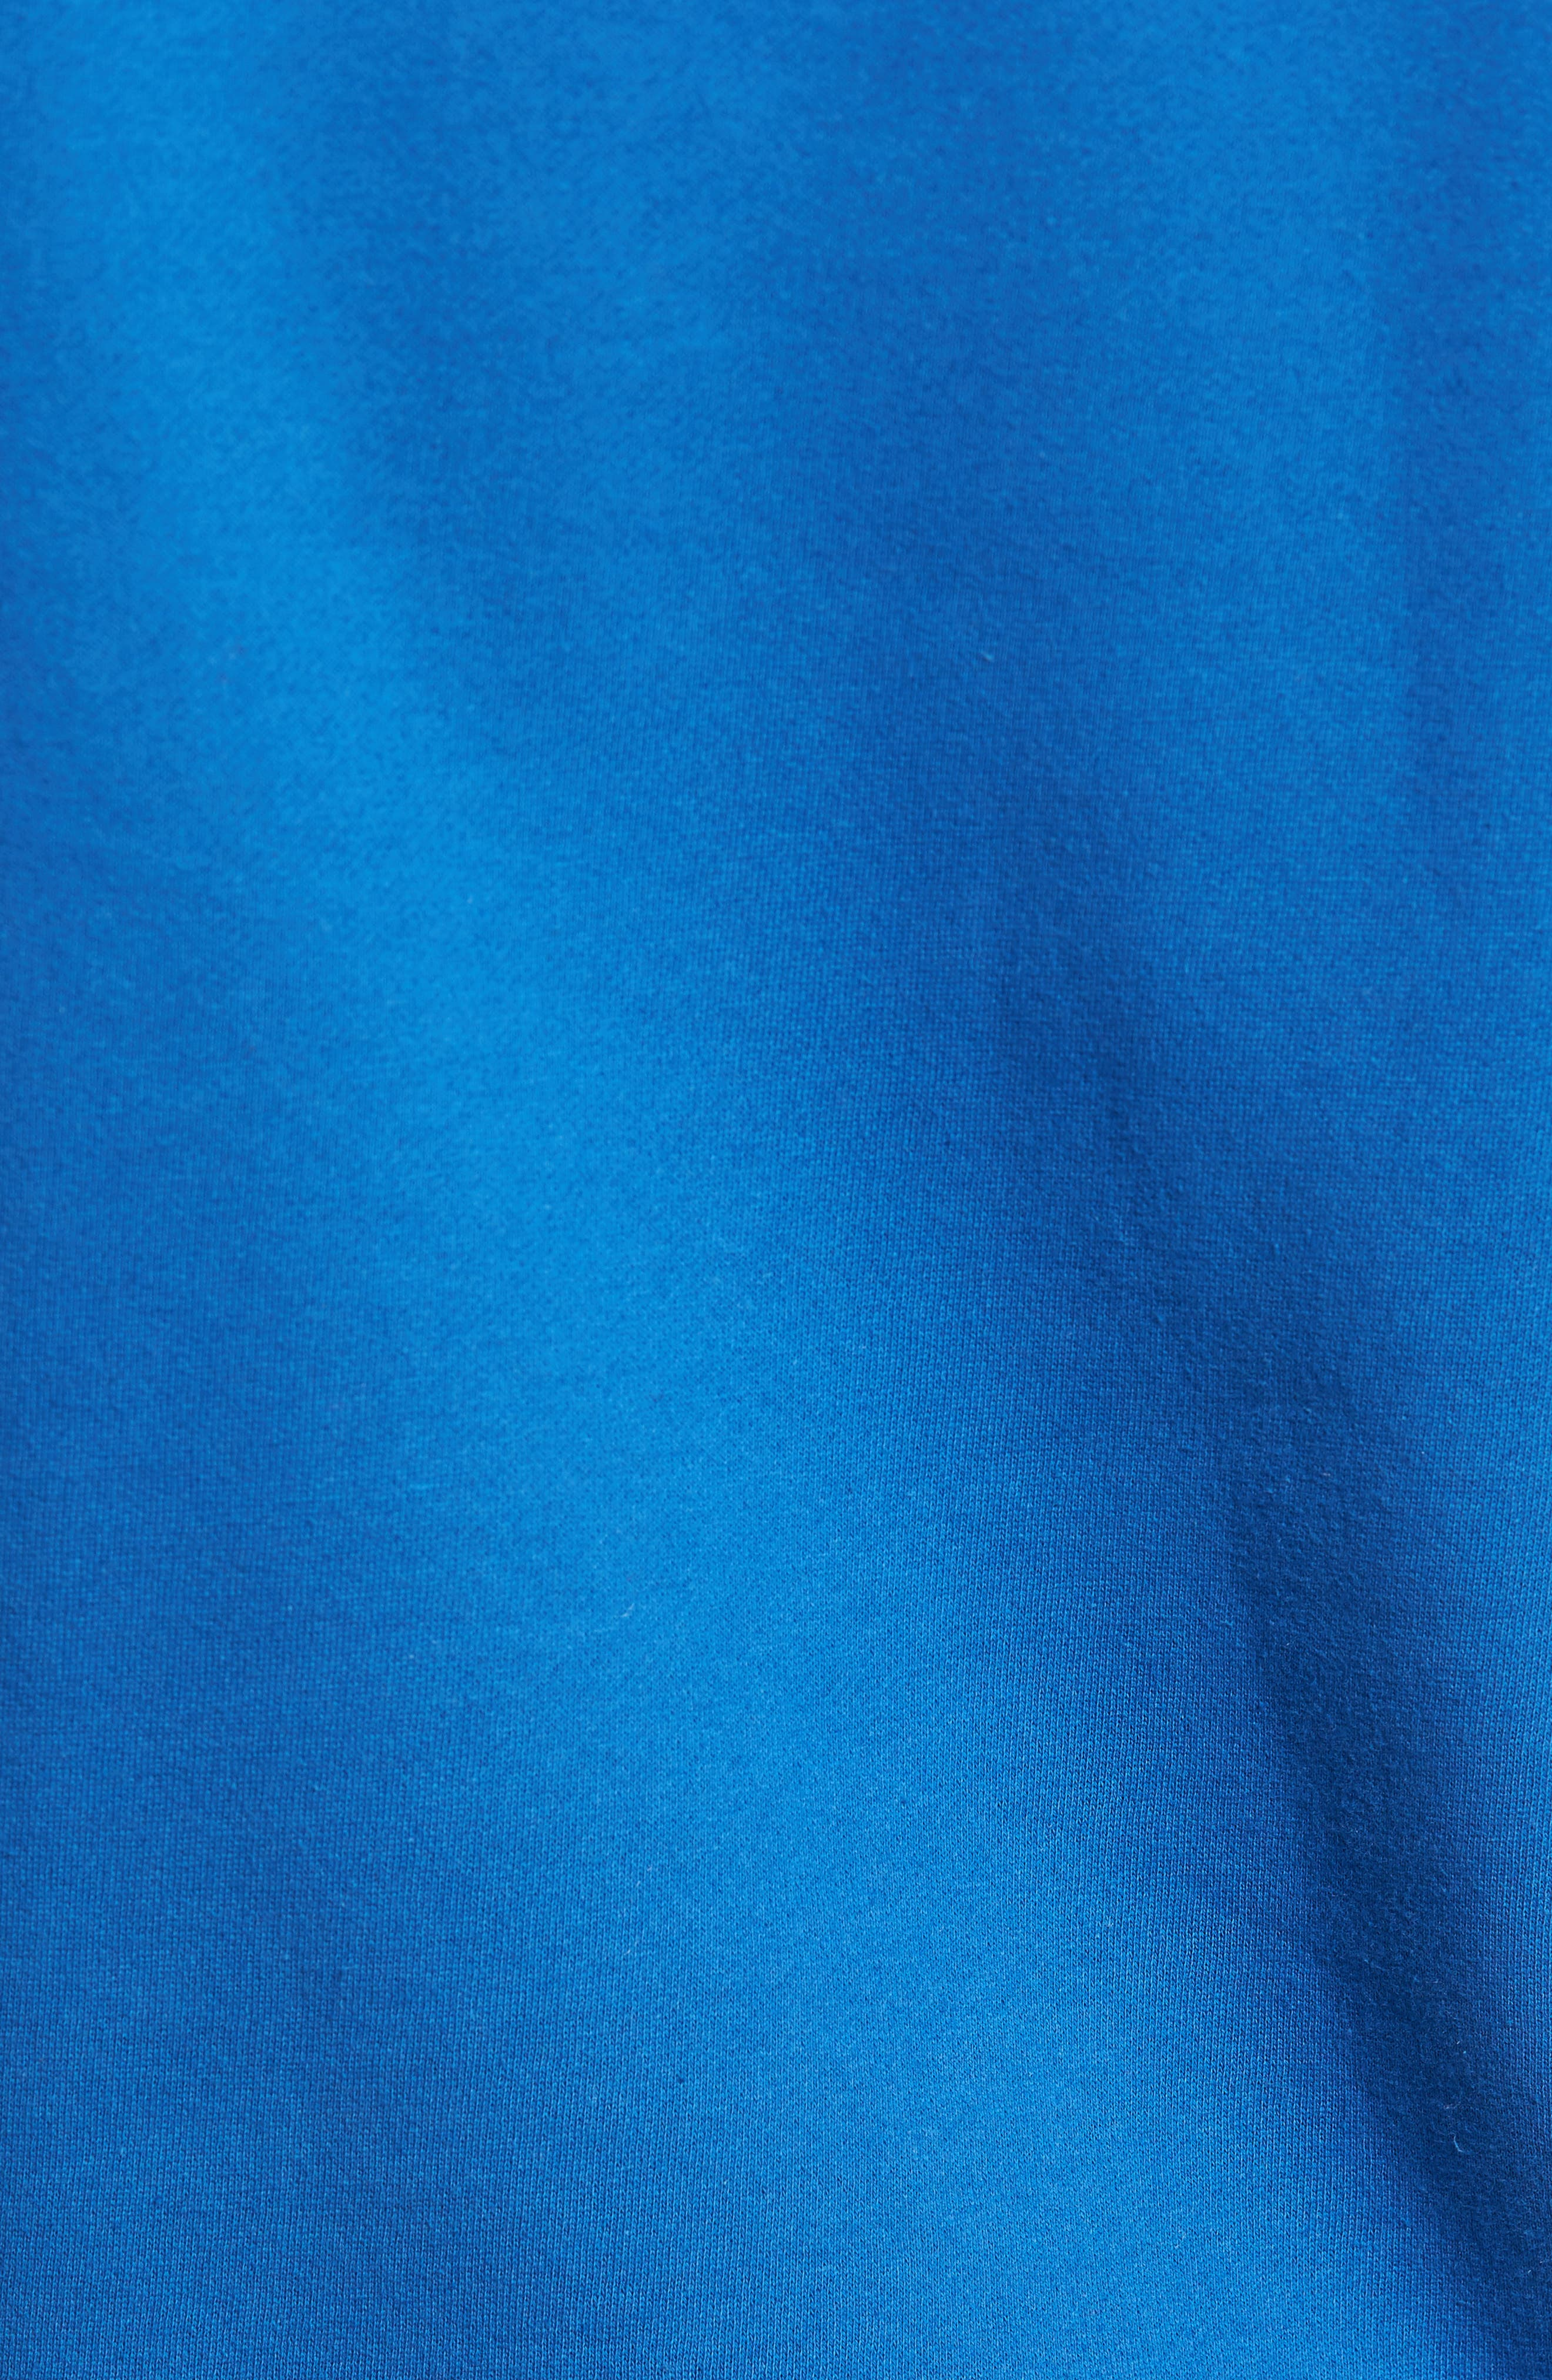 Alternate Reality Hoodie Sweatshirt,                             Alternate thumbnail 5, color,                             Royal Blue